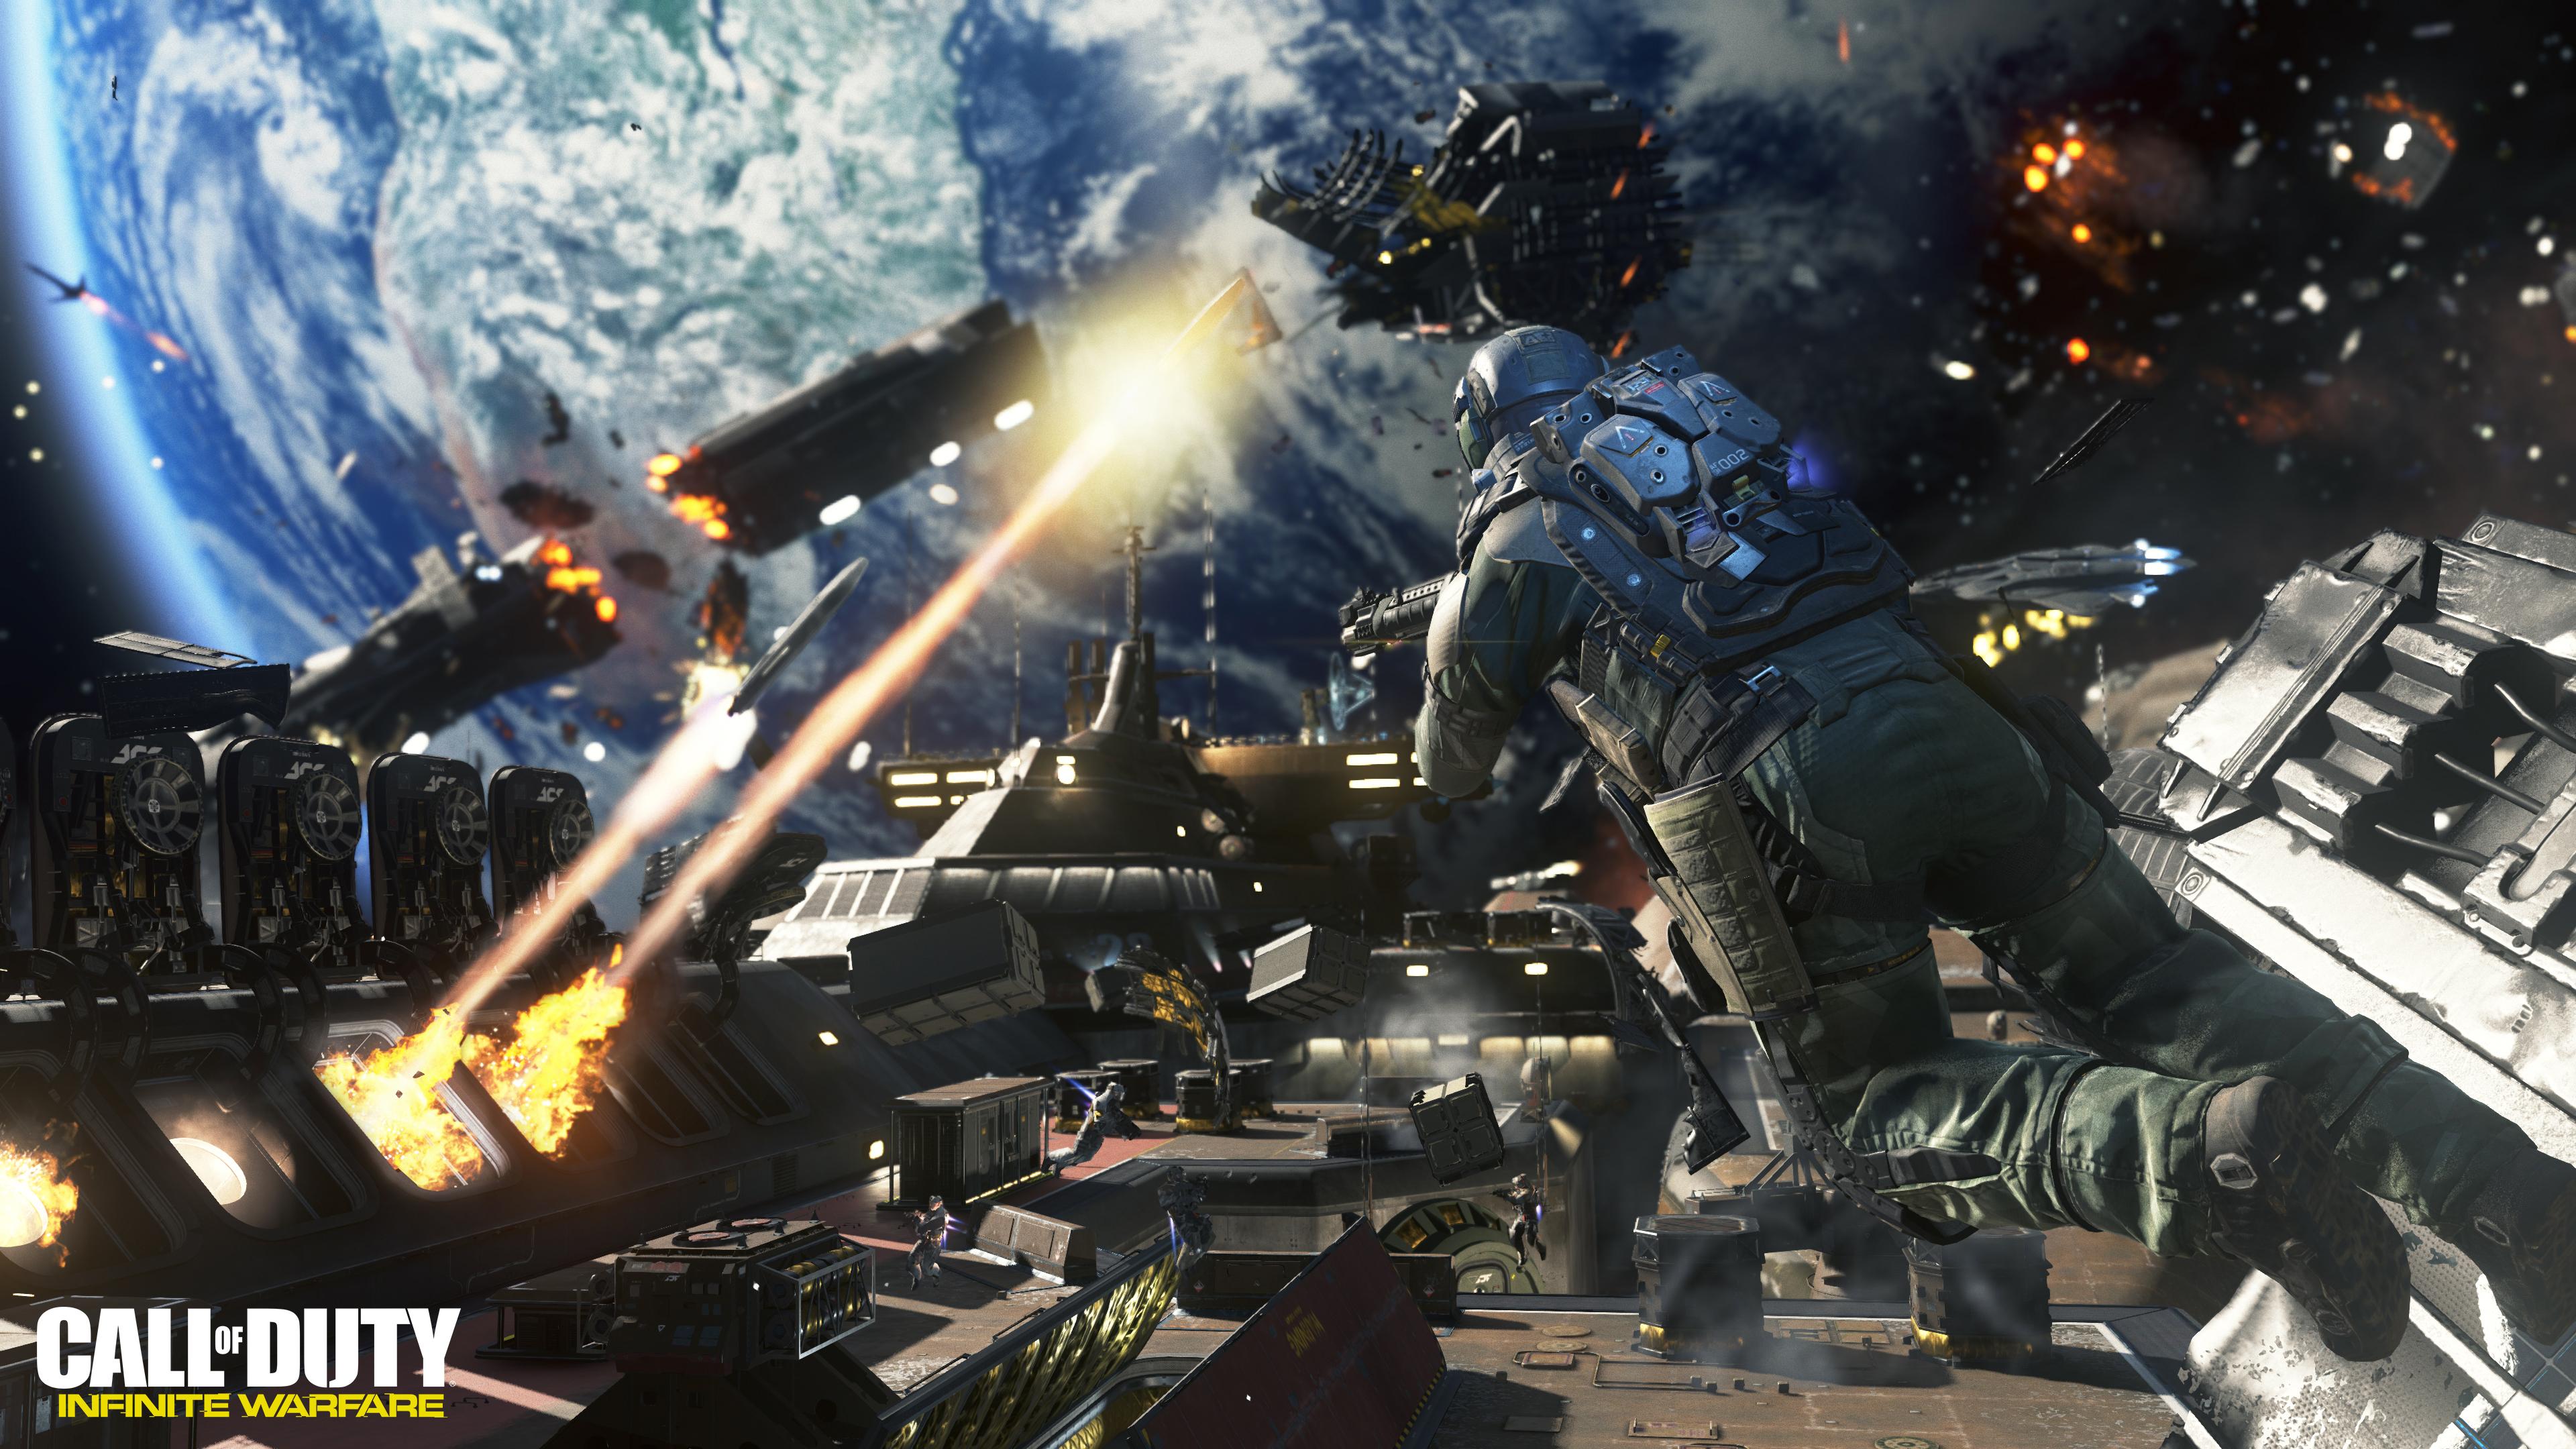 Call of Duty Infinite Warfare Space